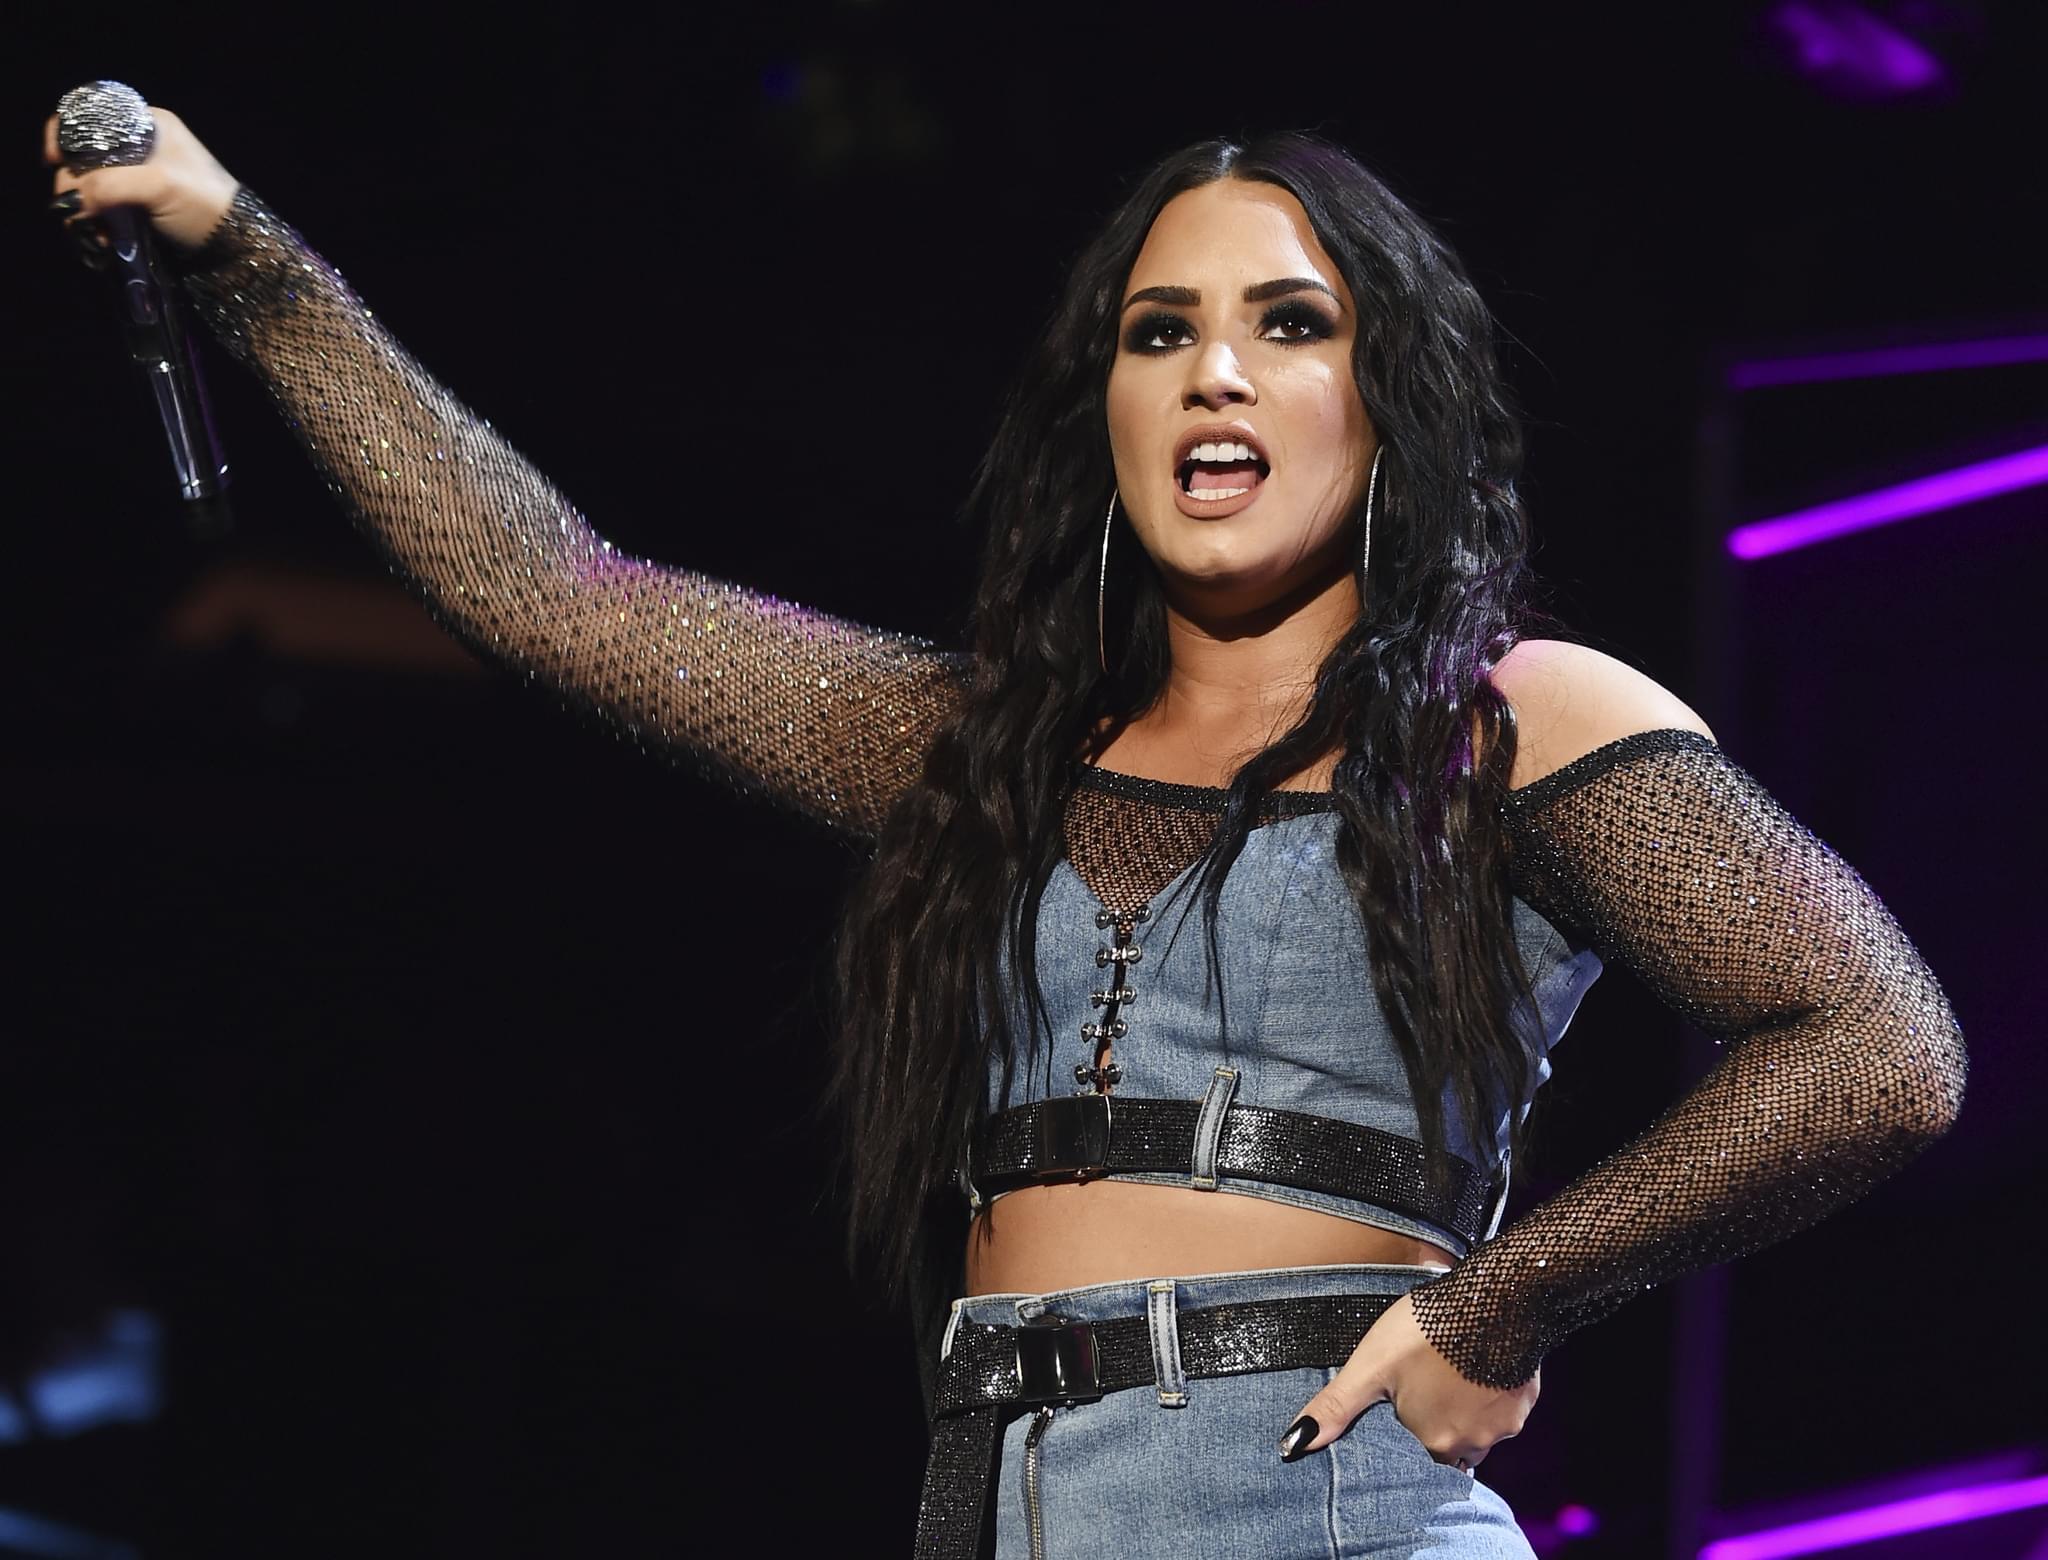 Demi Lovato Set to Sing the National Anthem – Super Bowl LIV